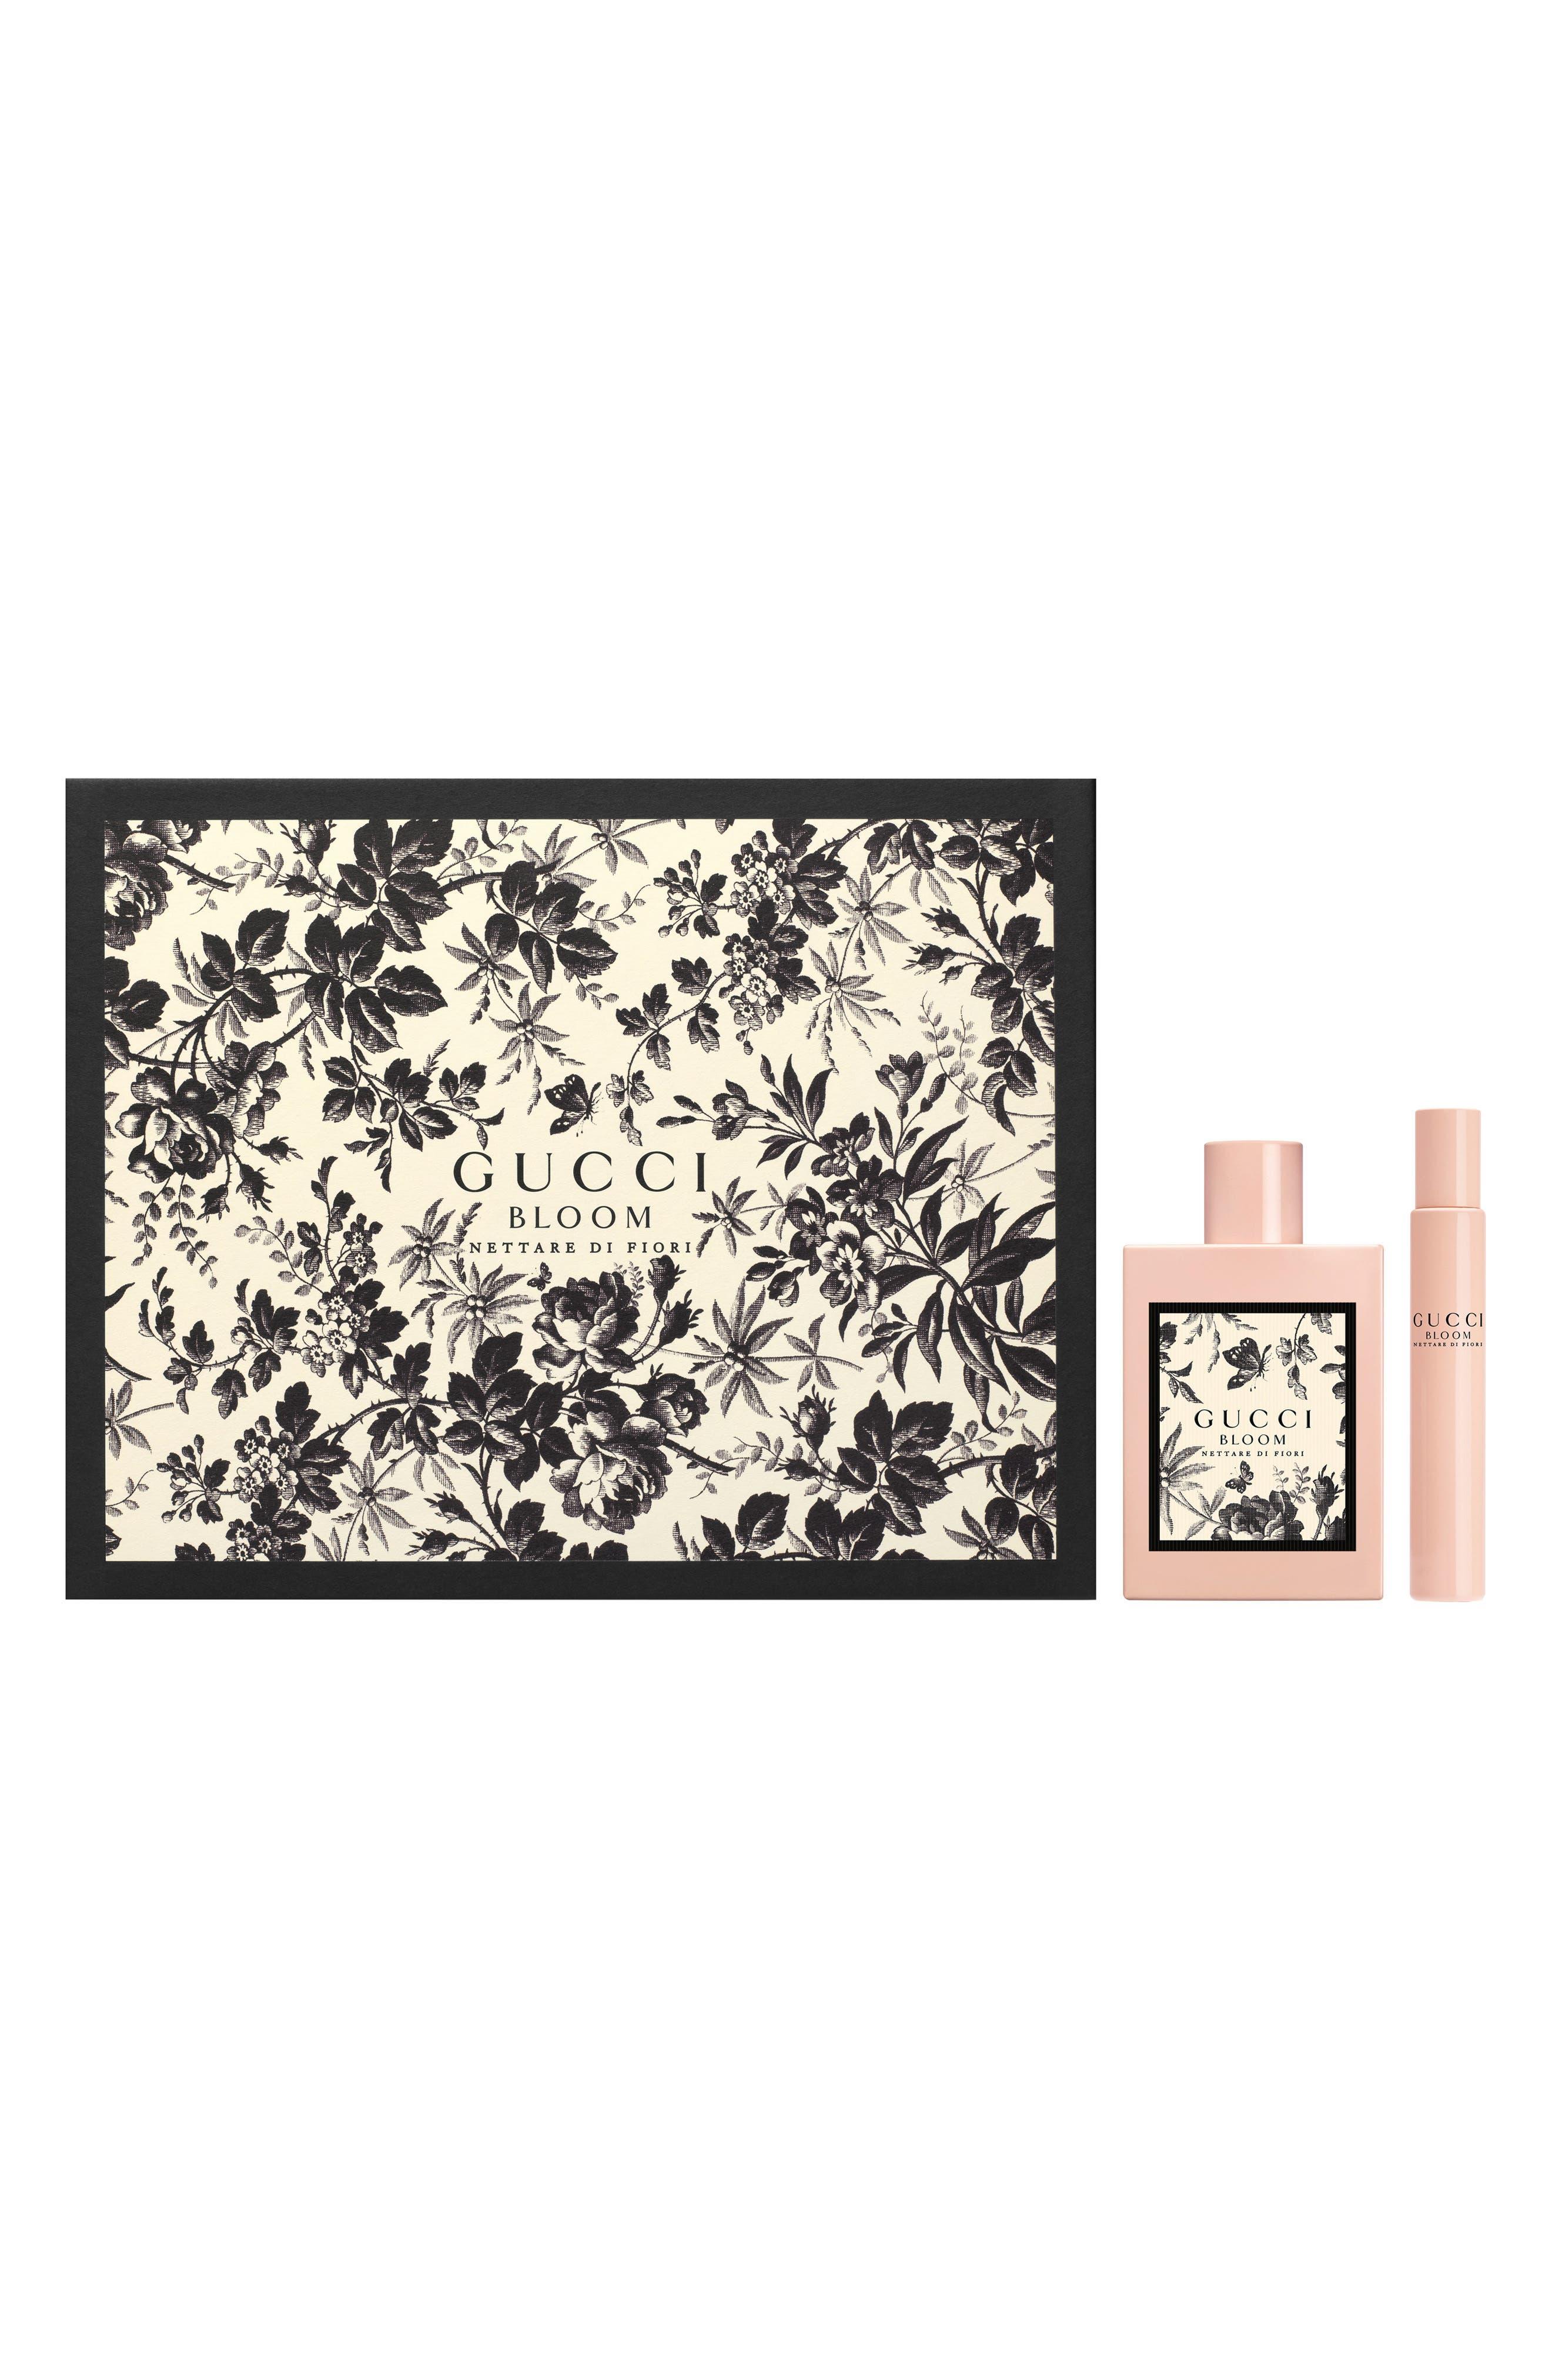 GUCCI Bloom Nettare Di Fiori Eau De Parfum Intense Set ($175 Value)